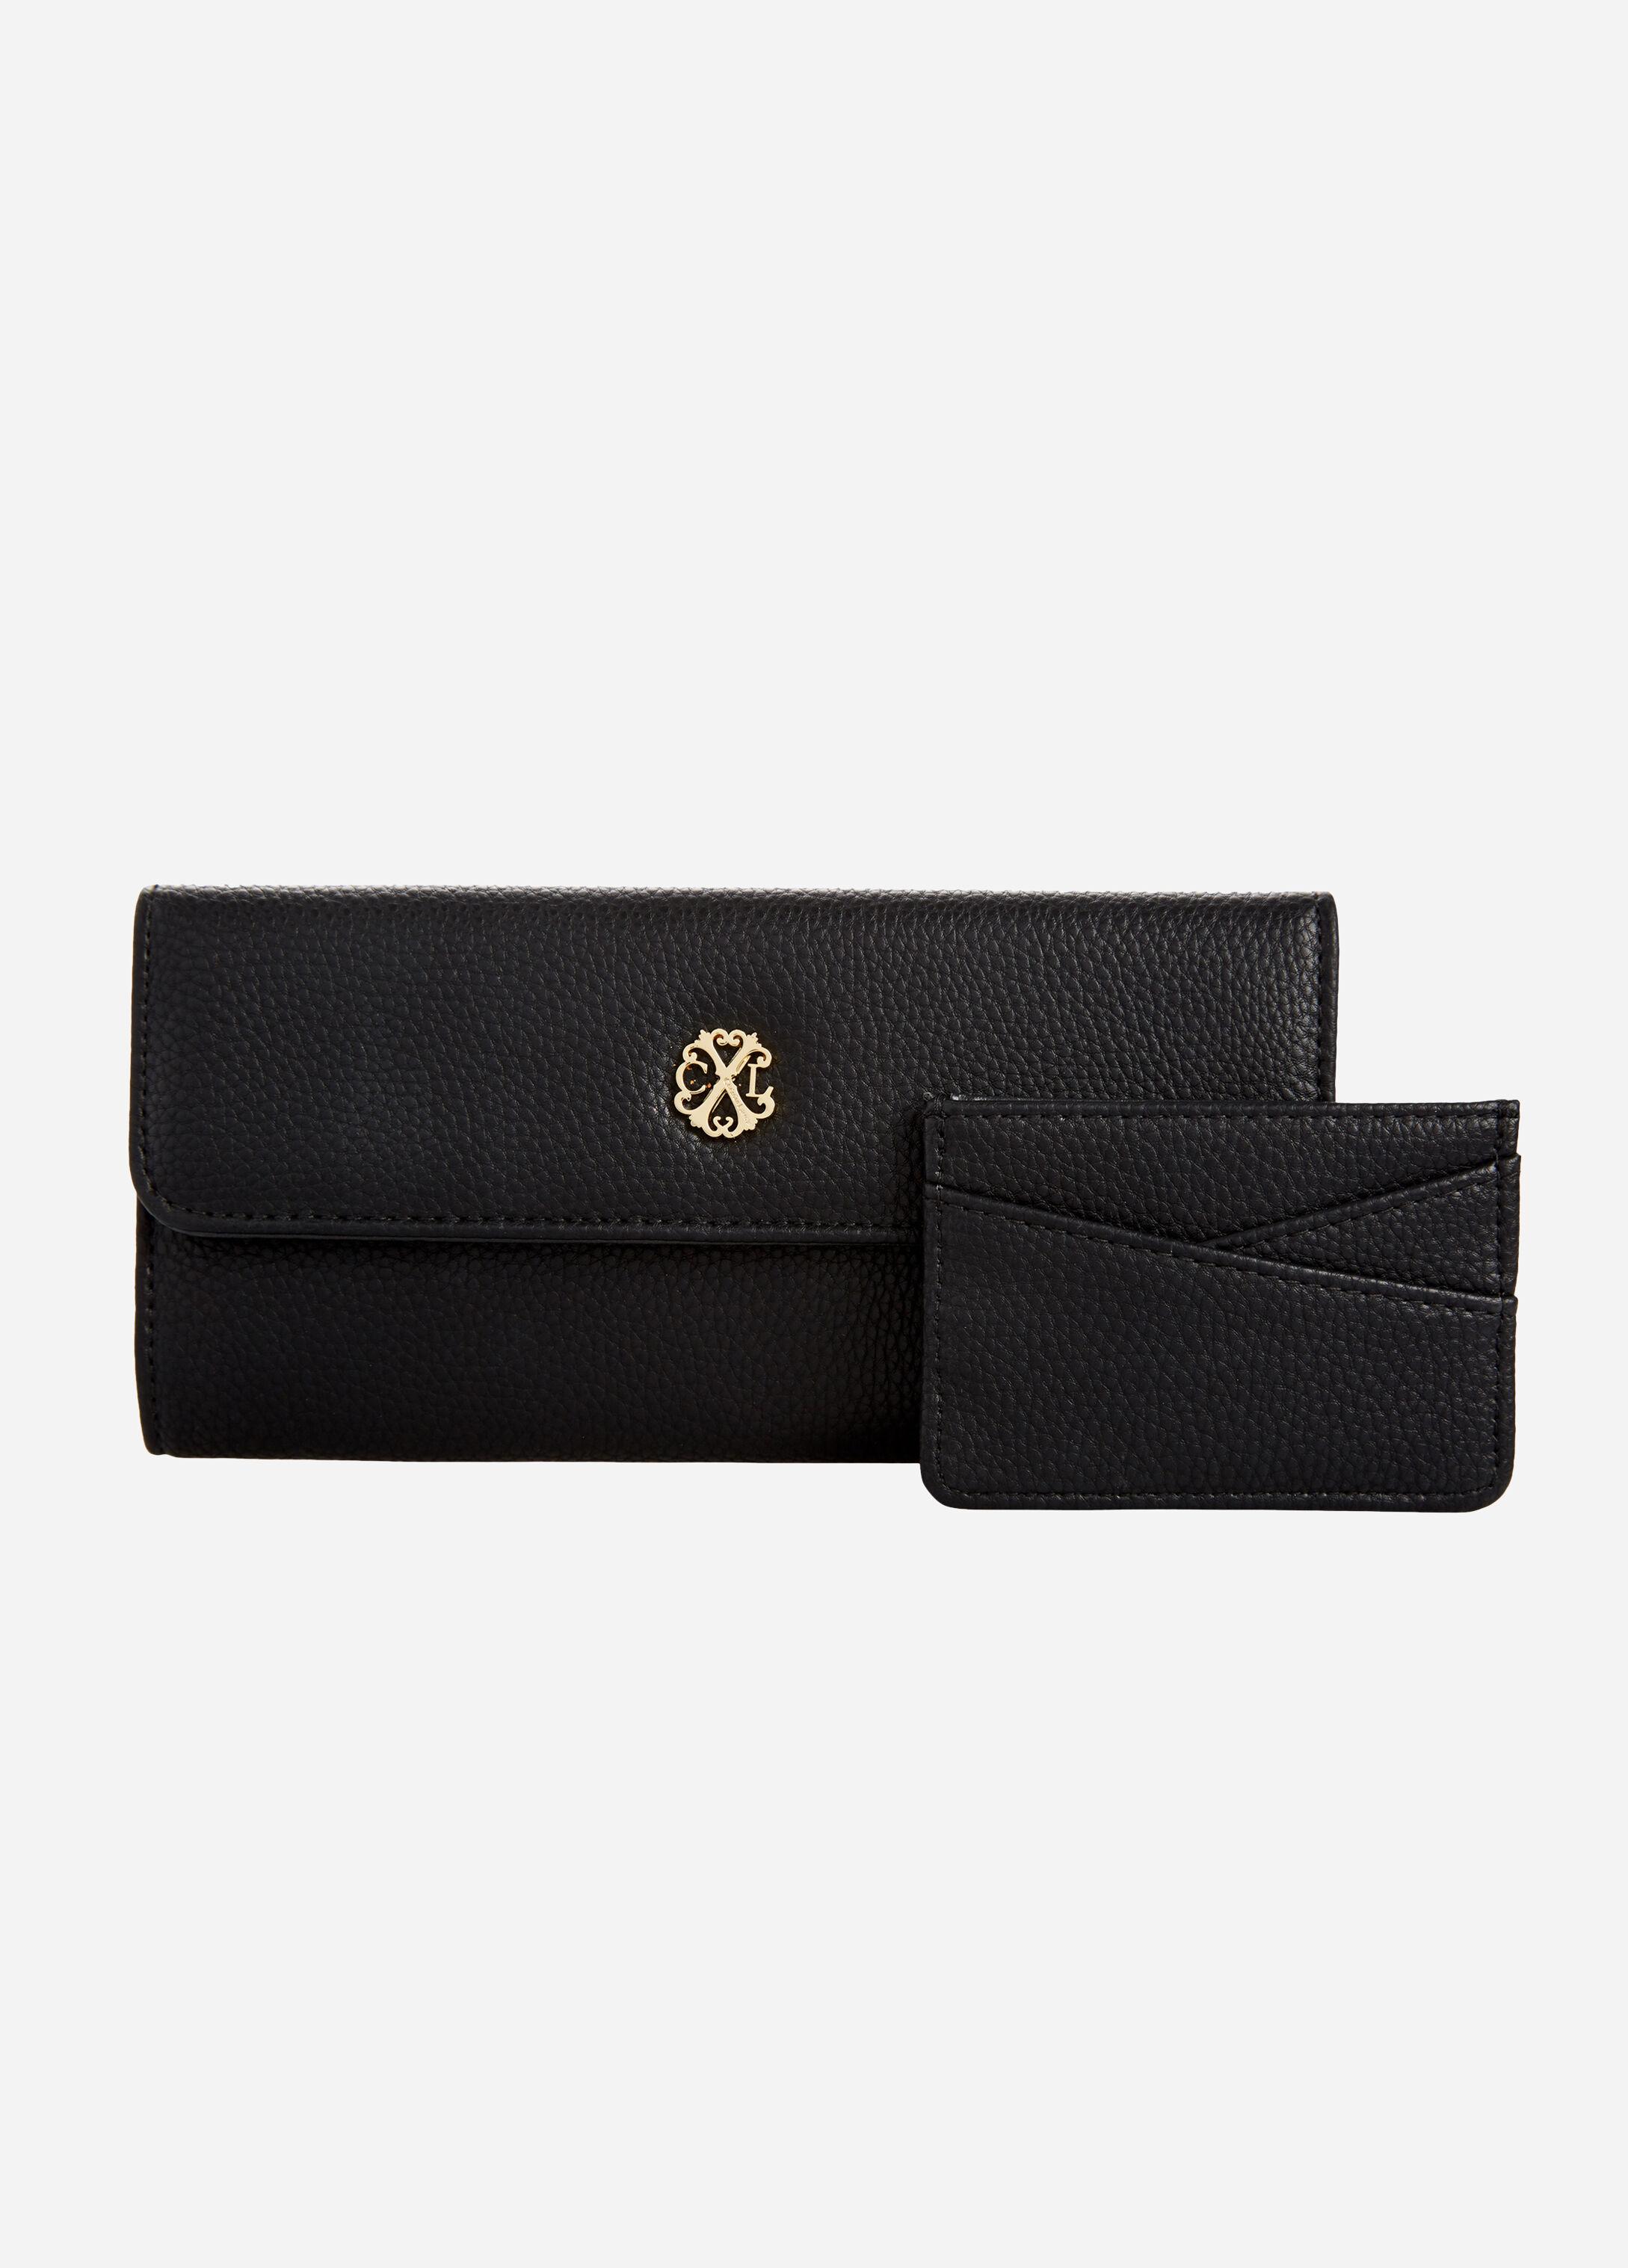 Christian Lacroix Josephine Boxed Wallet